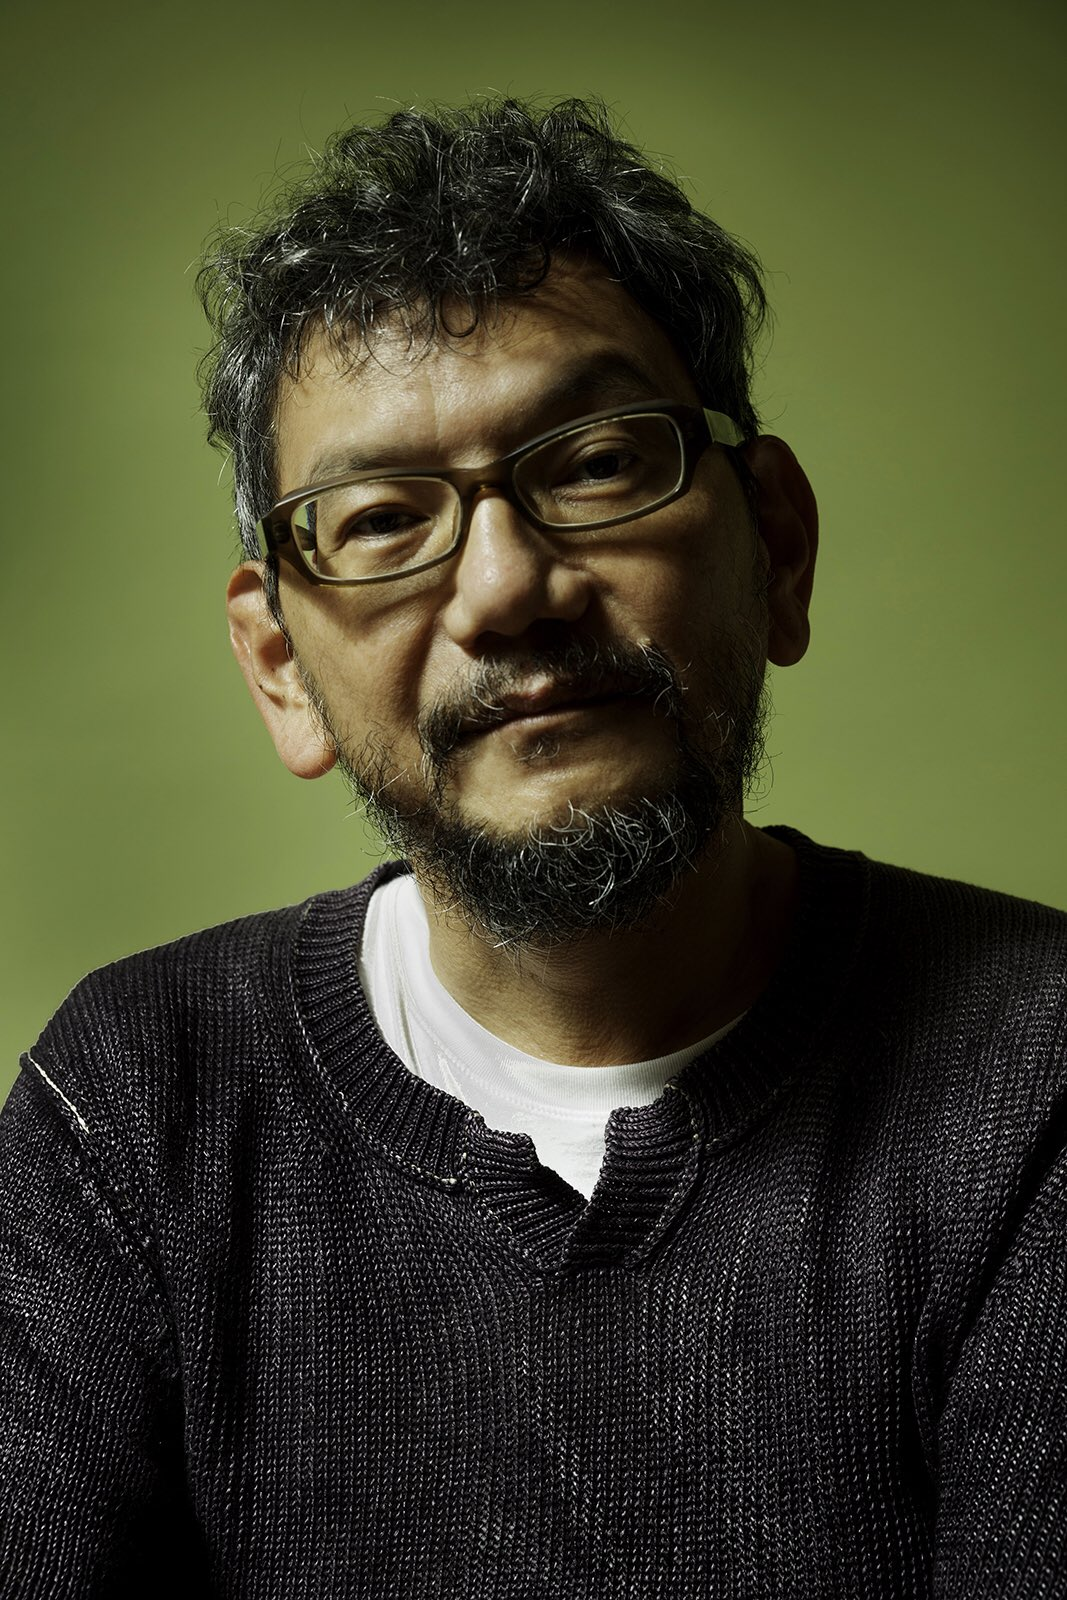 We wish a very happy birthday to the amazing director Hideaki Anno!